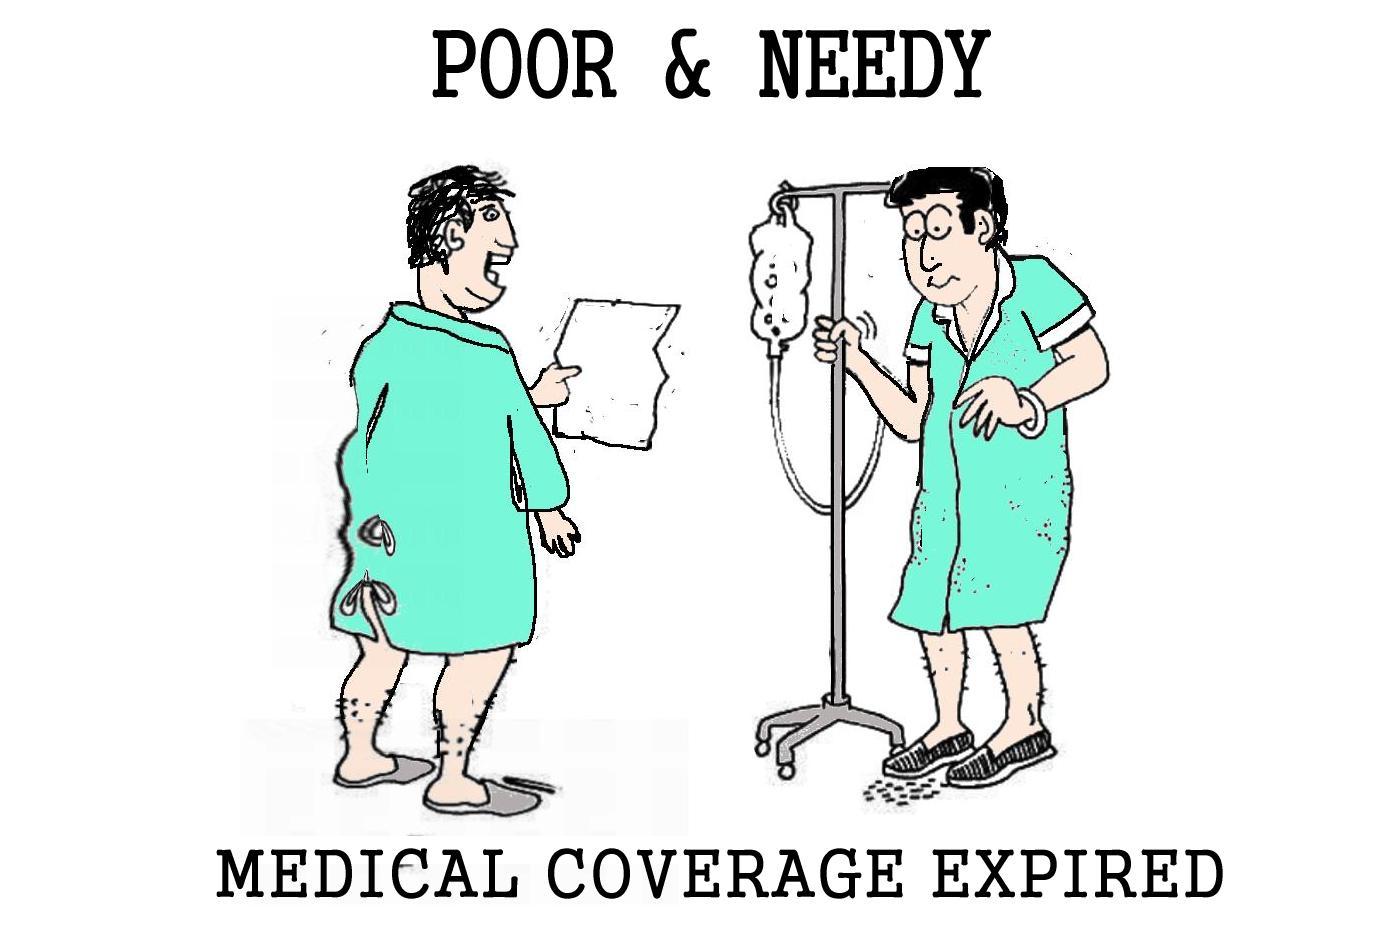 Funny Cartoon Wallpaper Images Free Download 1400x931